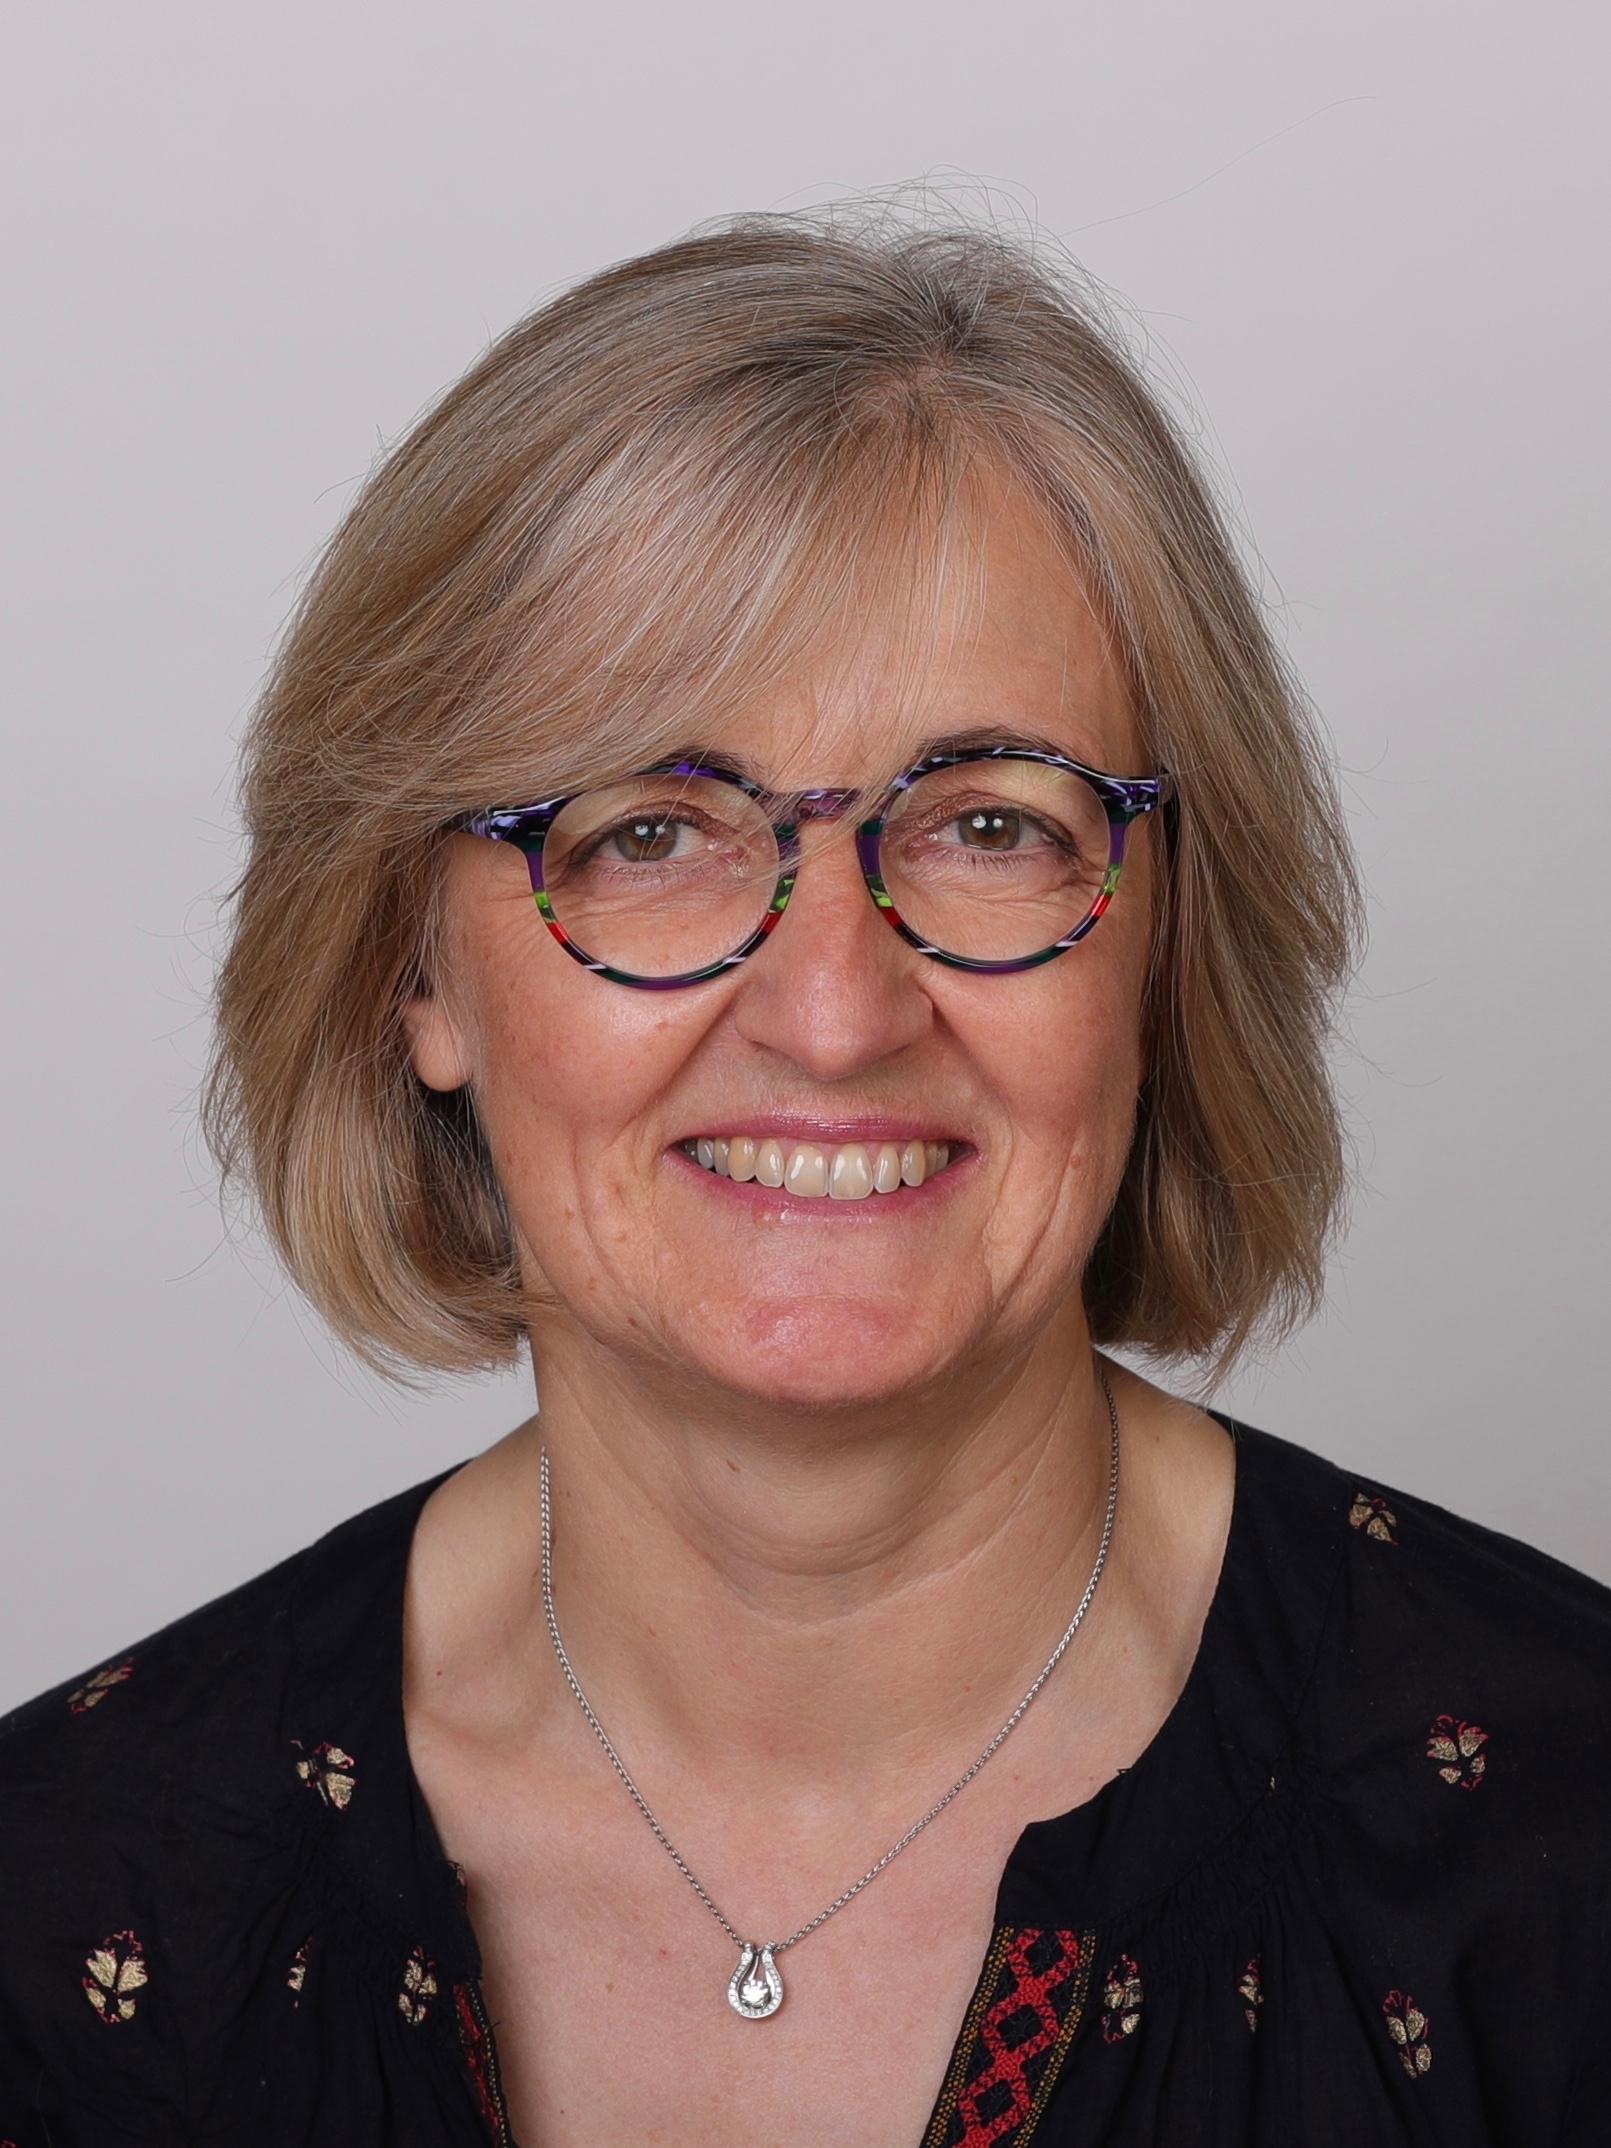 Nicole de Fontaines